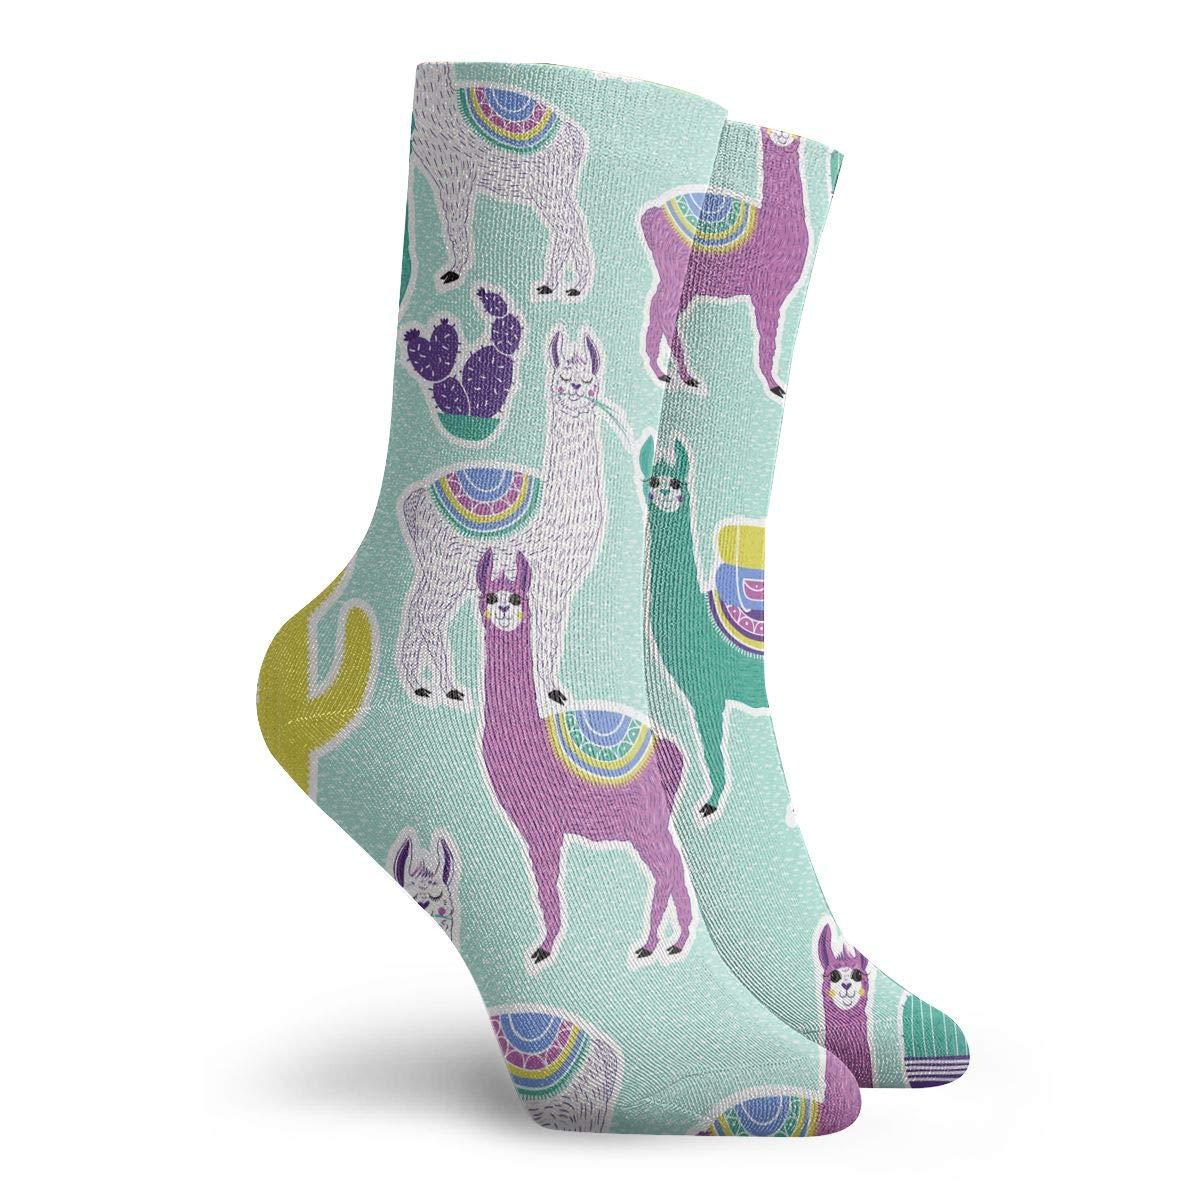 Sweet Llama Or Alpaca And Cactus Fashion Dress Socks Short Socks Leisure Travel 11.8 Inch